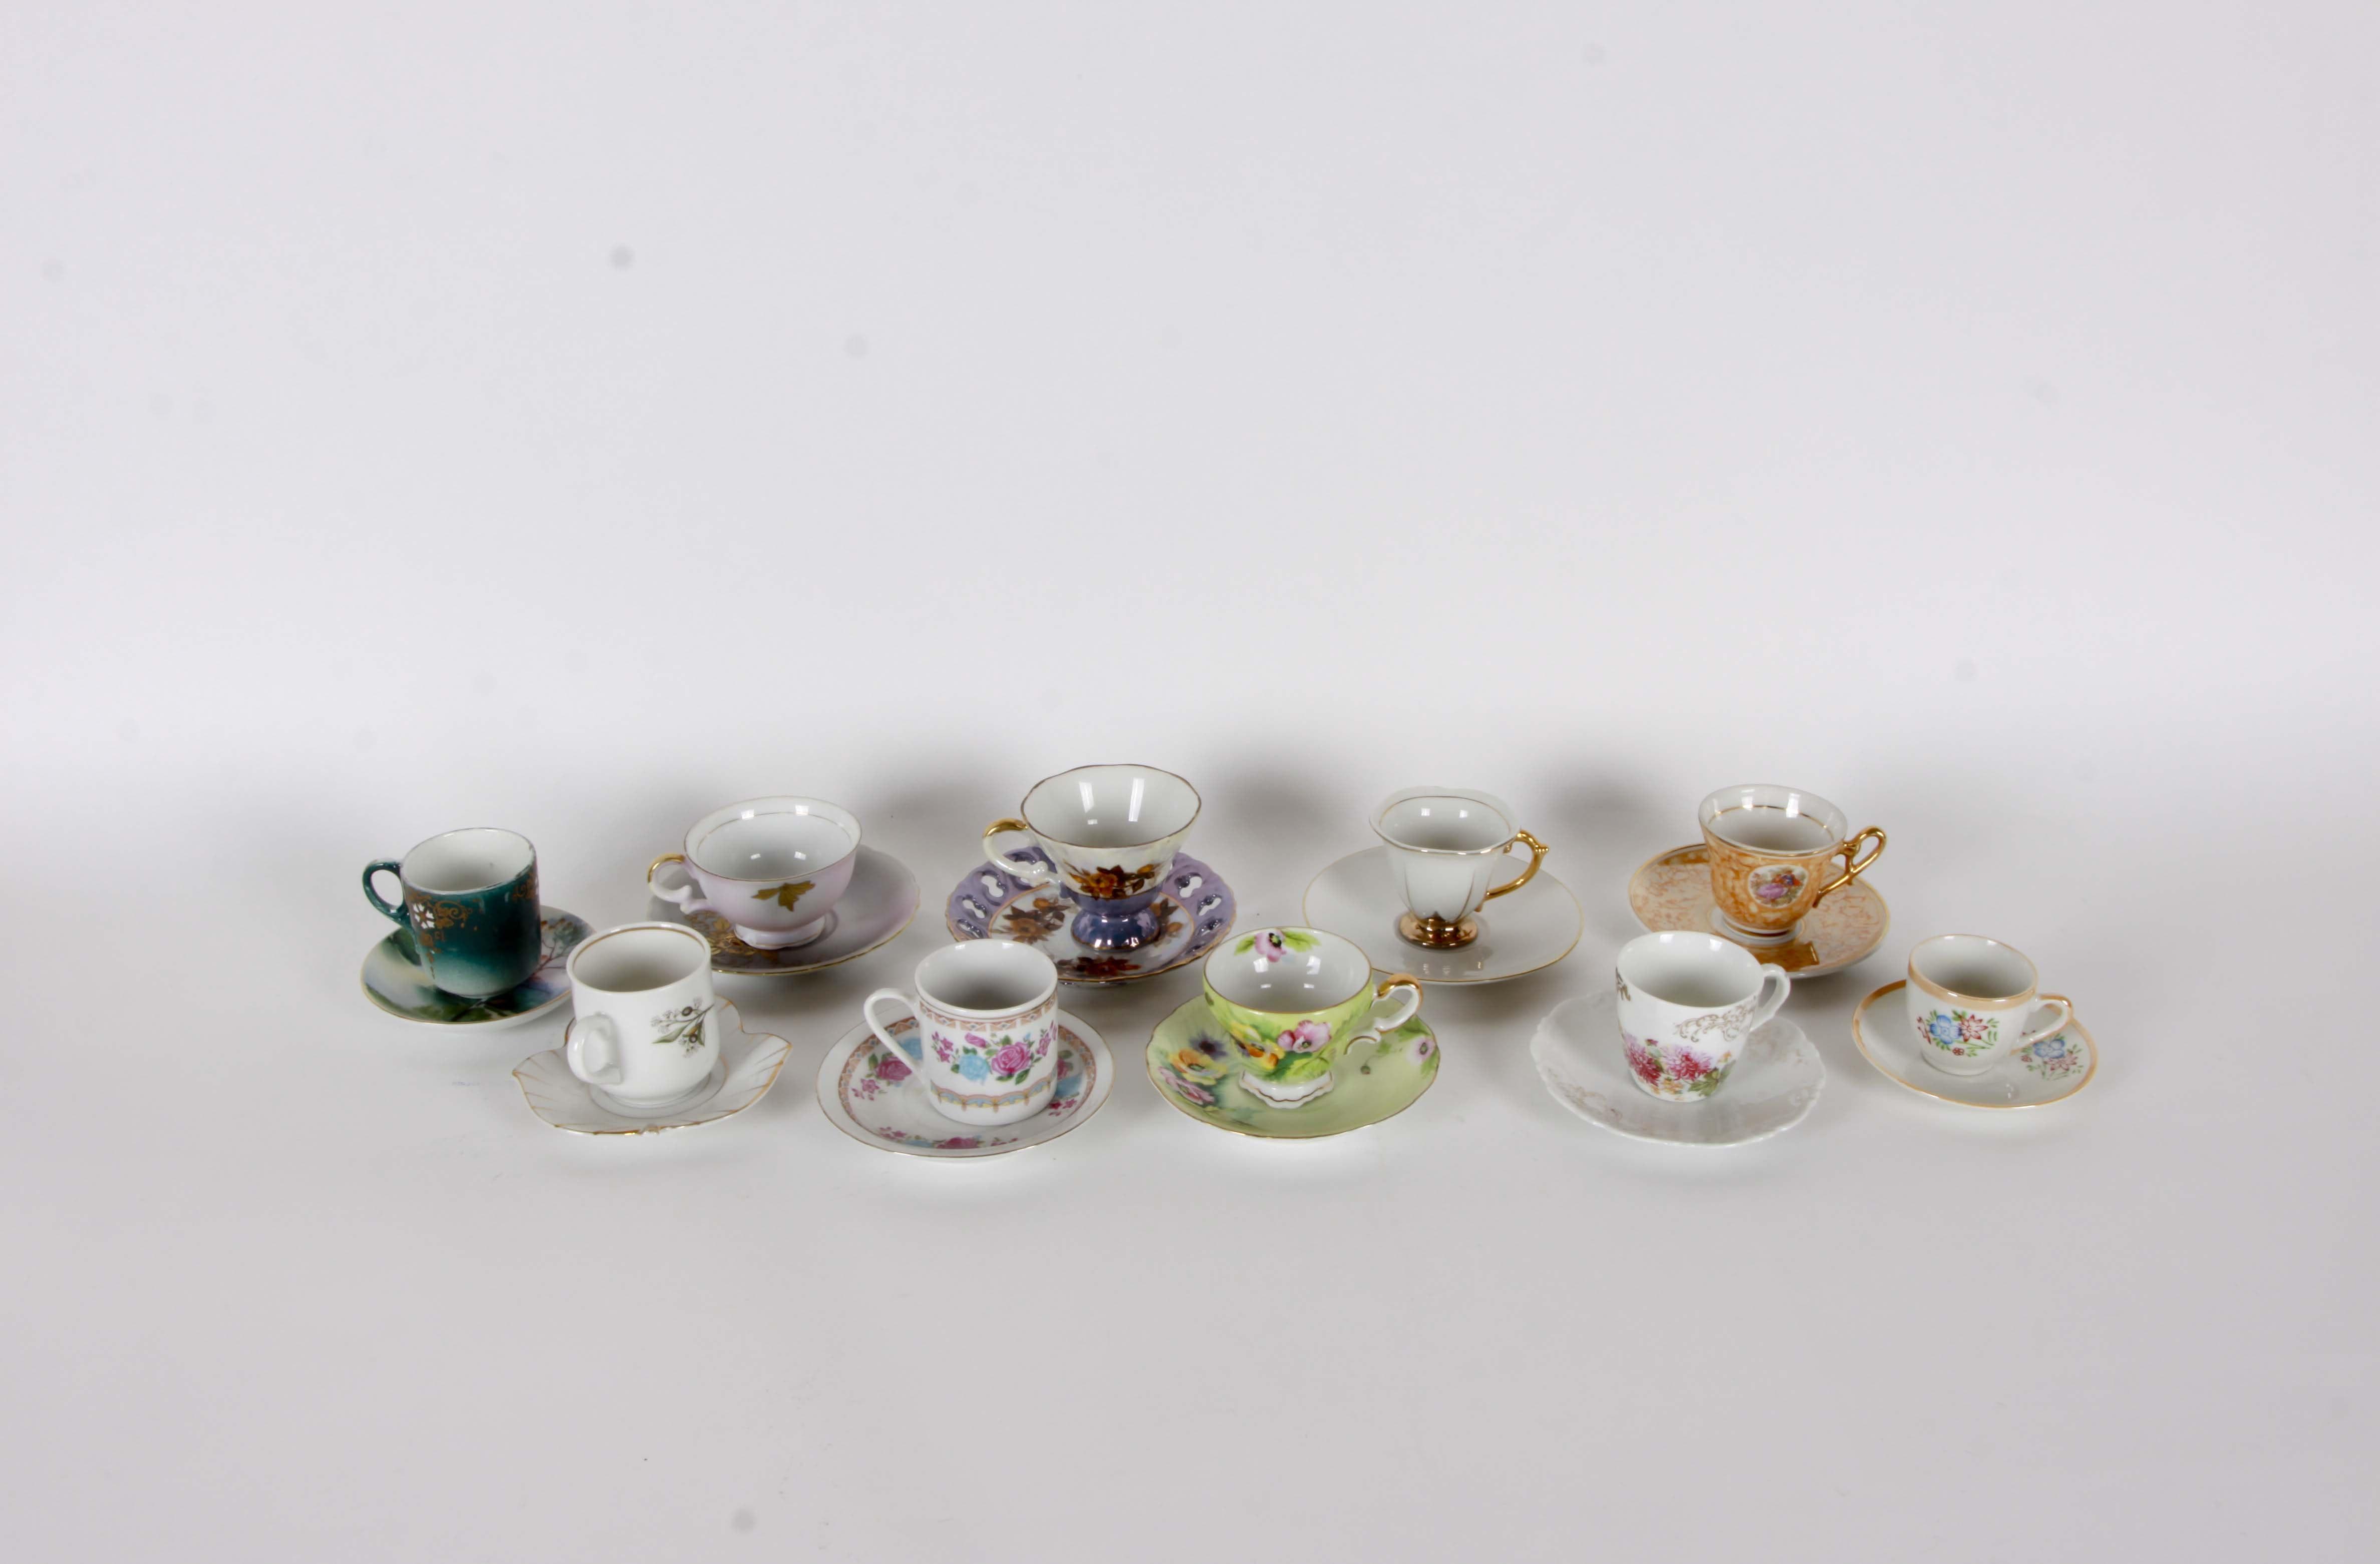 Vintage Teacup Assortment